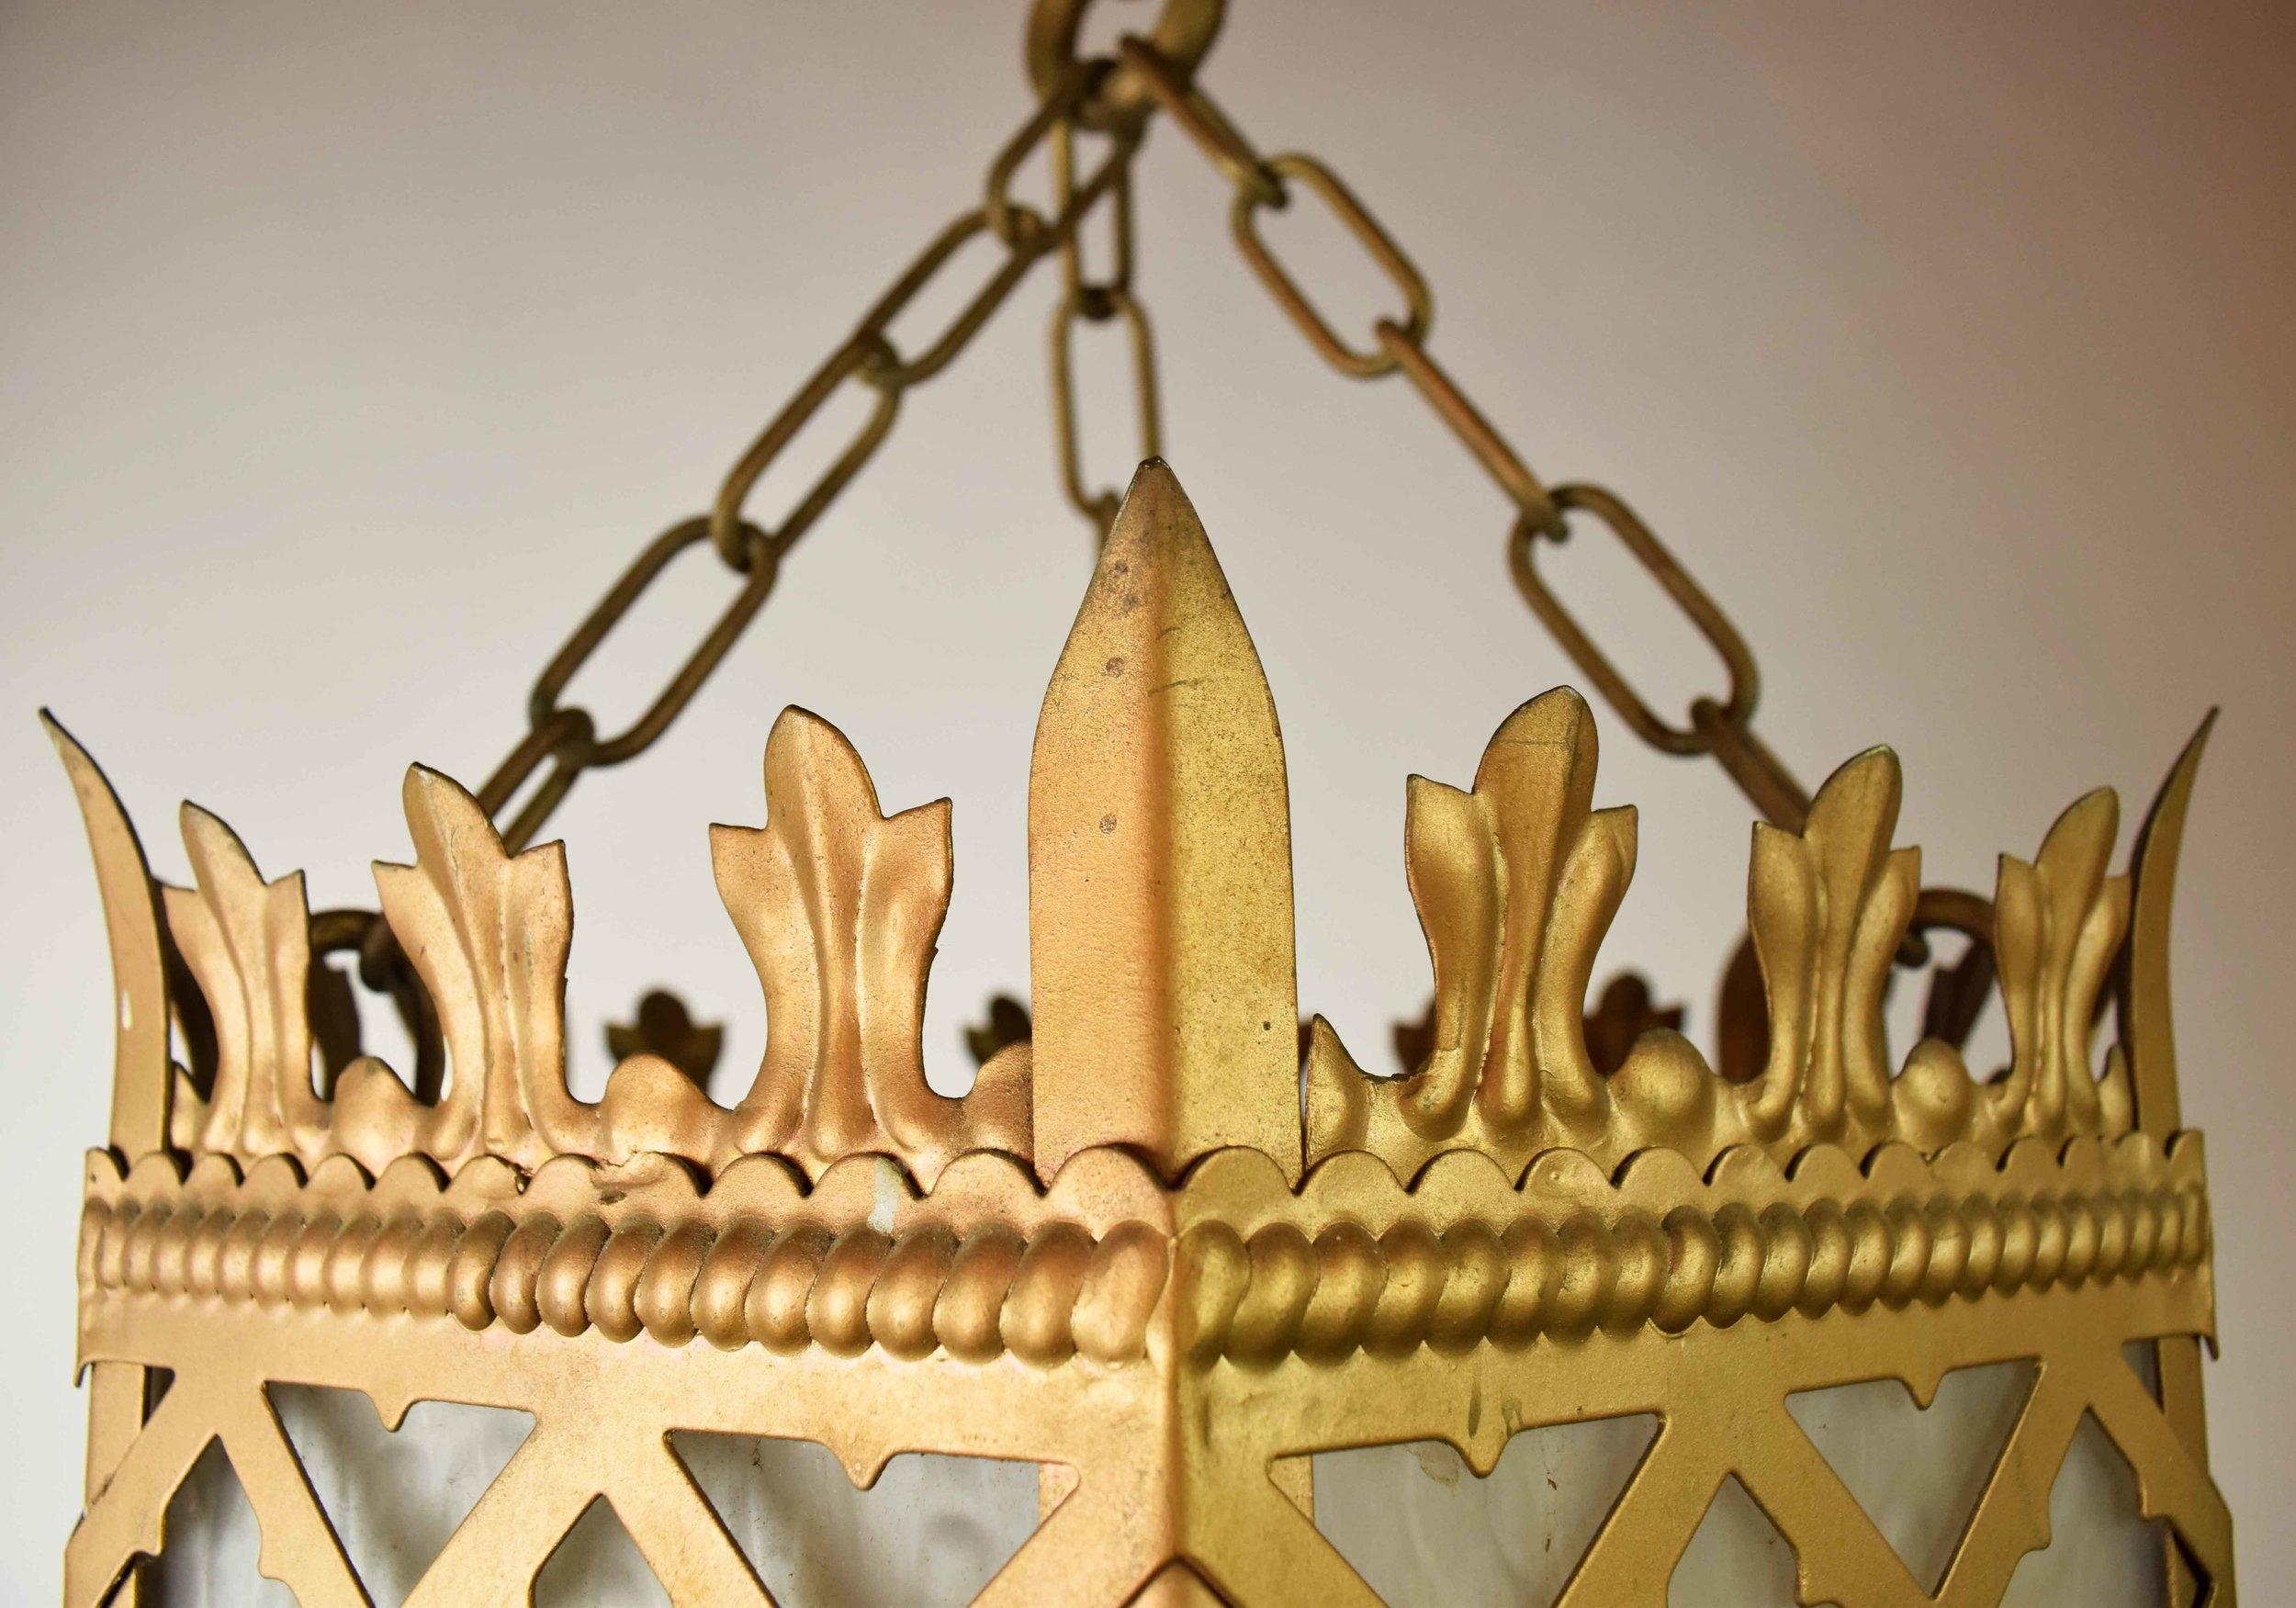 42641-large-gothic-pendant-detail top.JPG